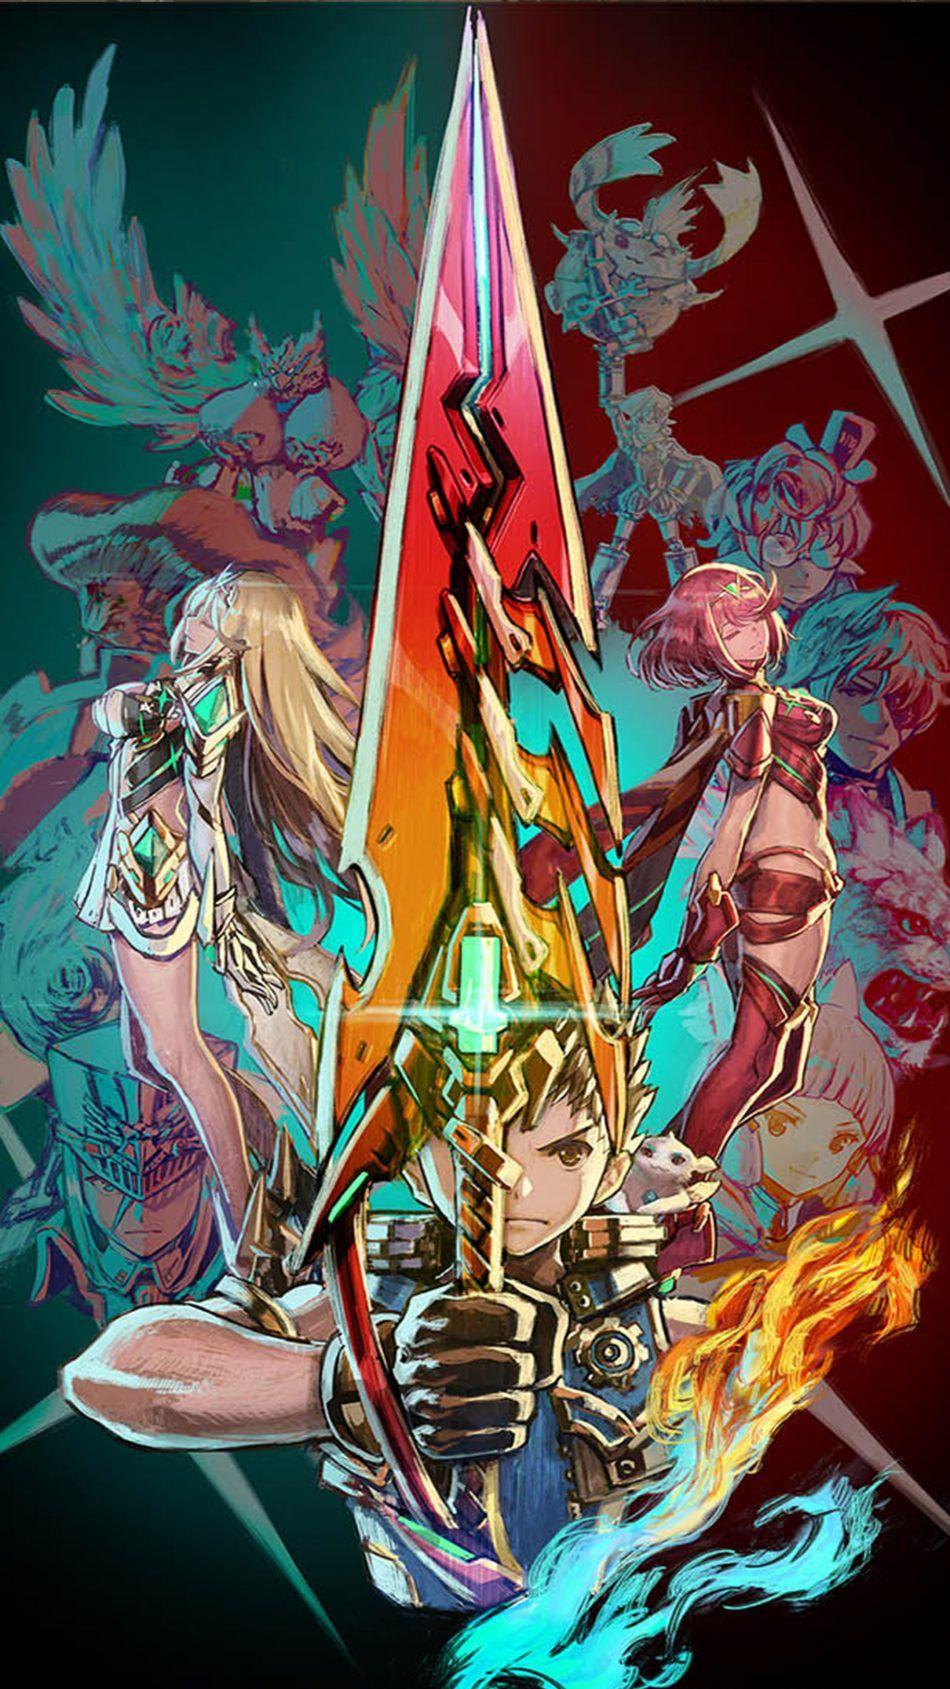 Xenoblade Chronicles 2 4k Ultra Hd Mobile Wallpaper Xenoblade Chronicles Xenoblade Chronicles 2 Xenoblade Chronicles Wallpapers